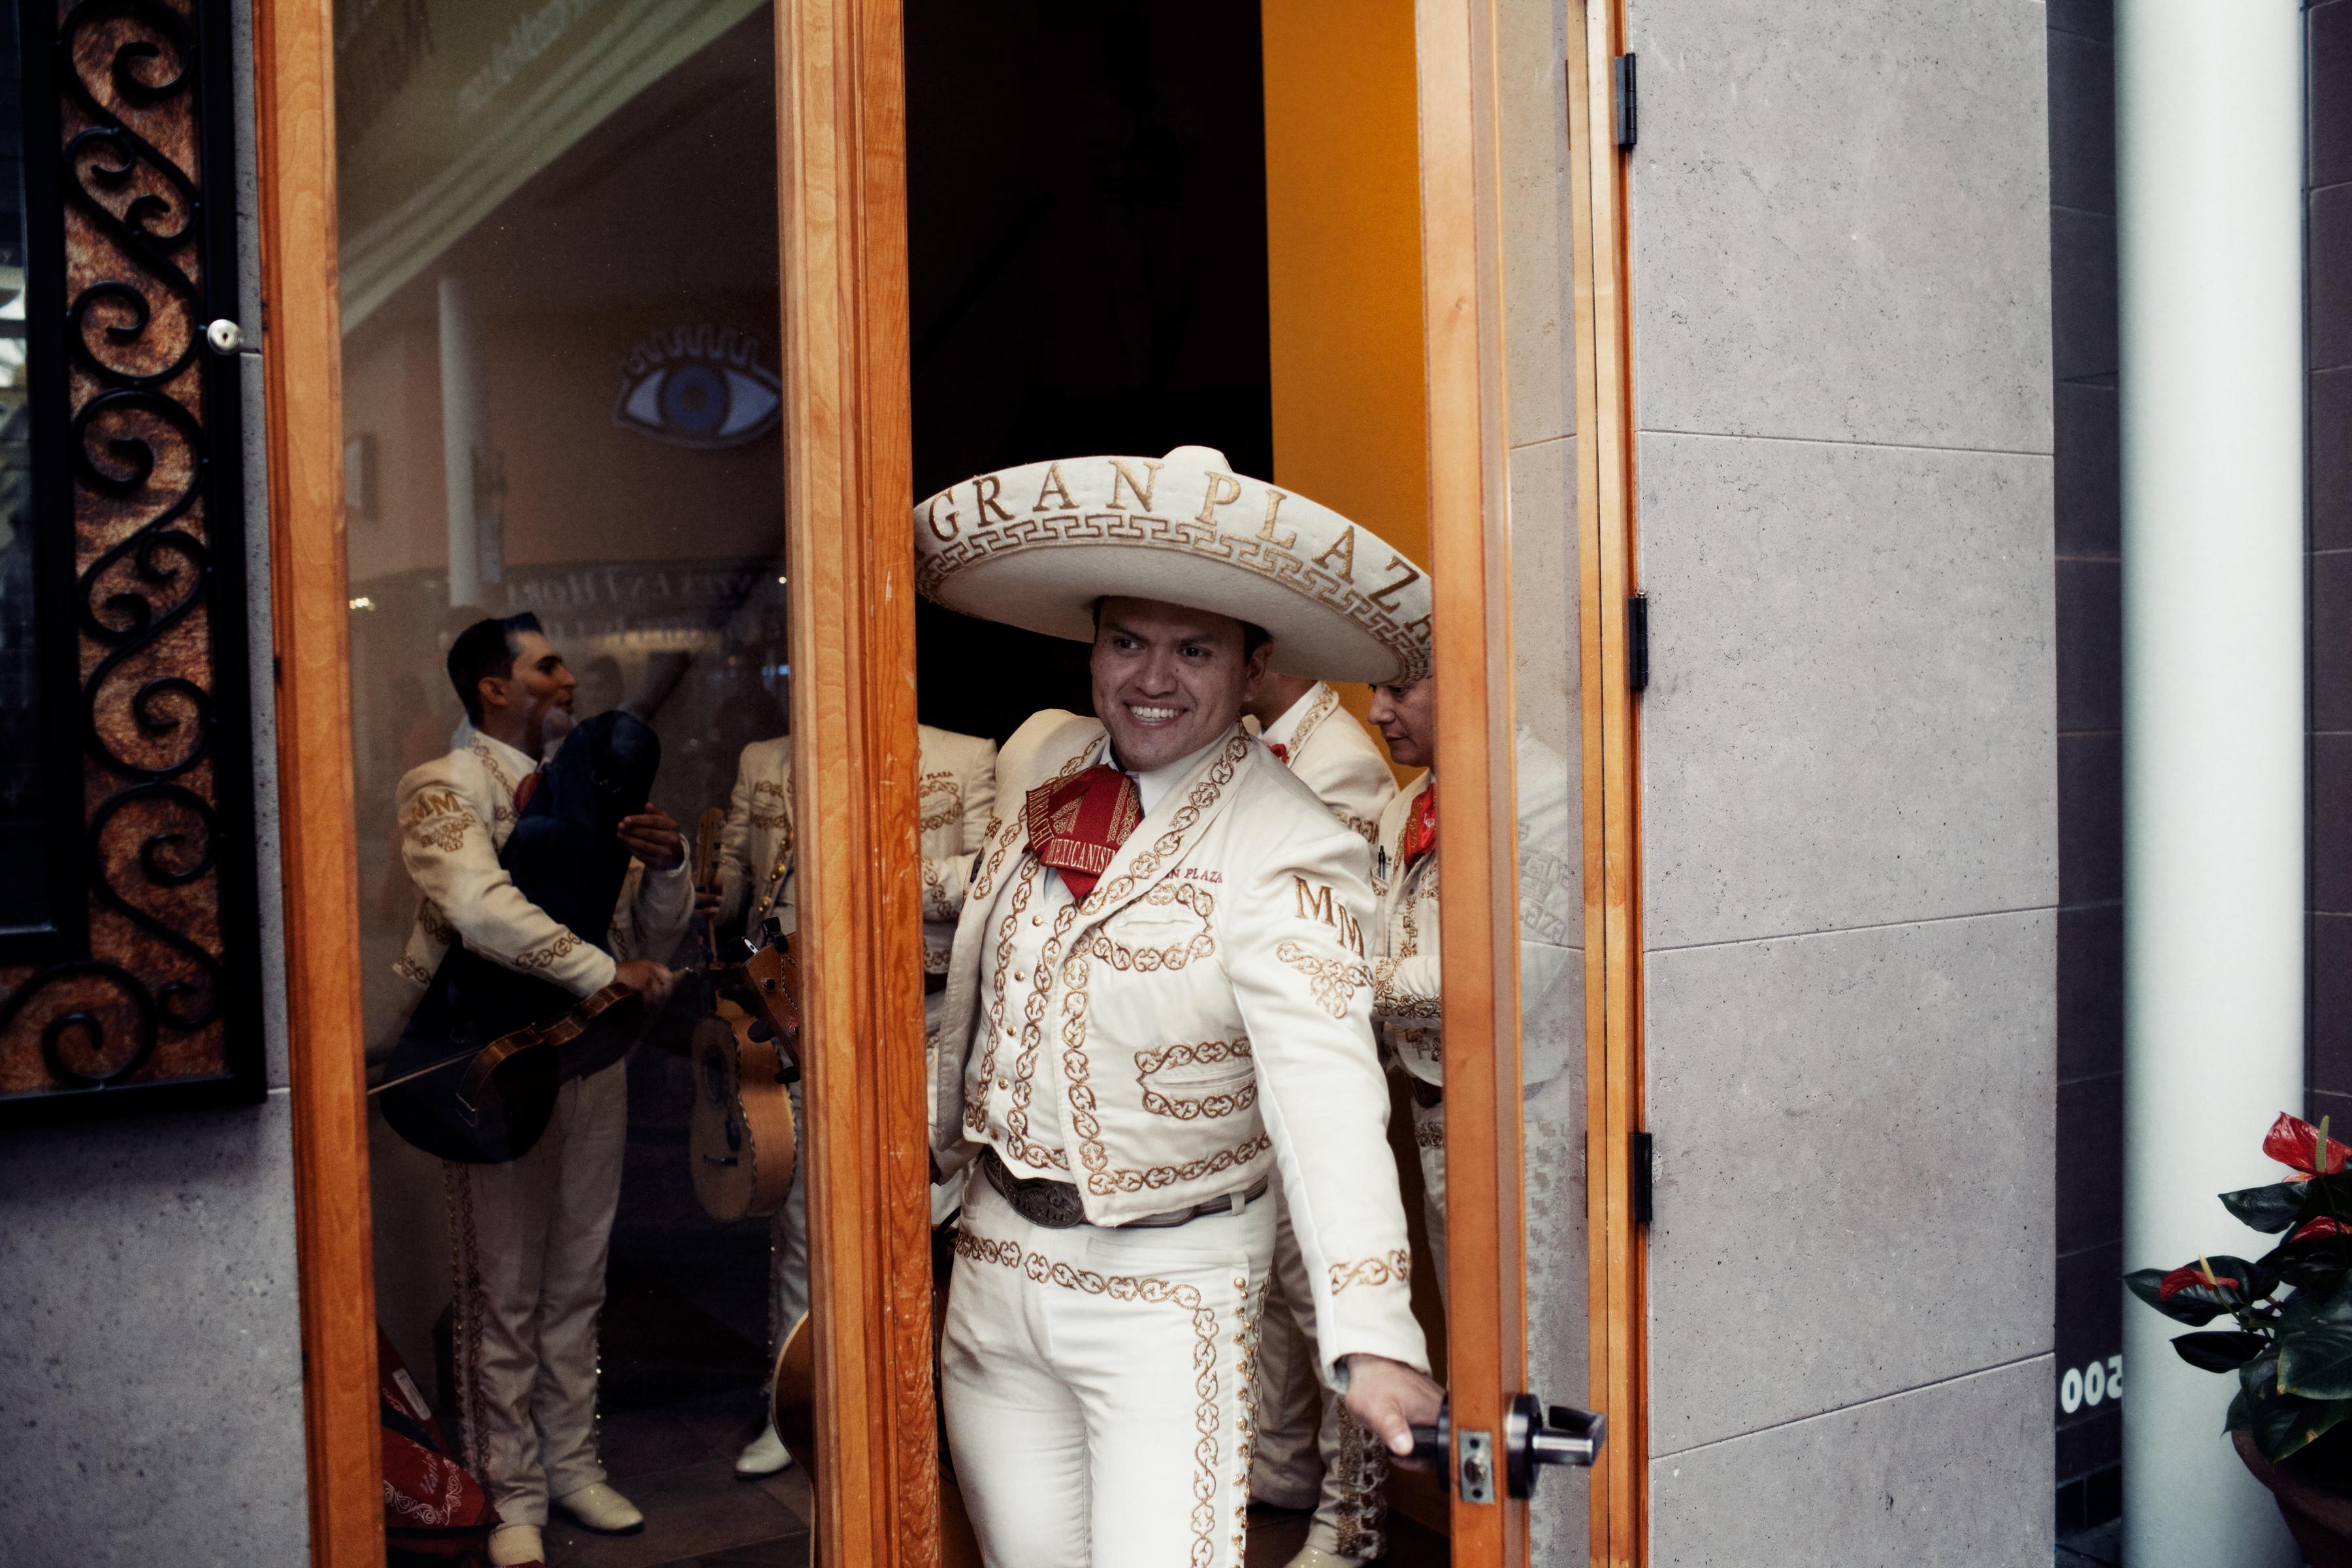 A mariachi at La Gran Plaza mall outside Fort Worth, Texas.